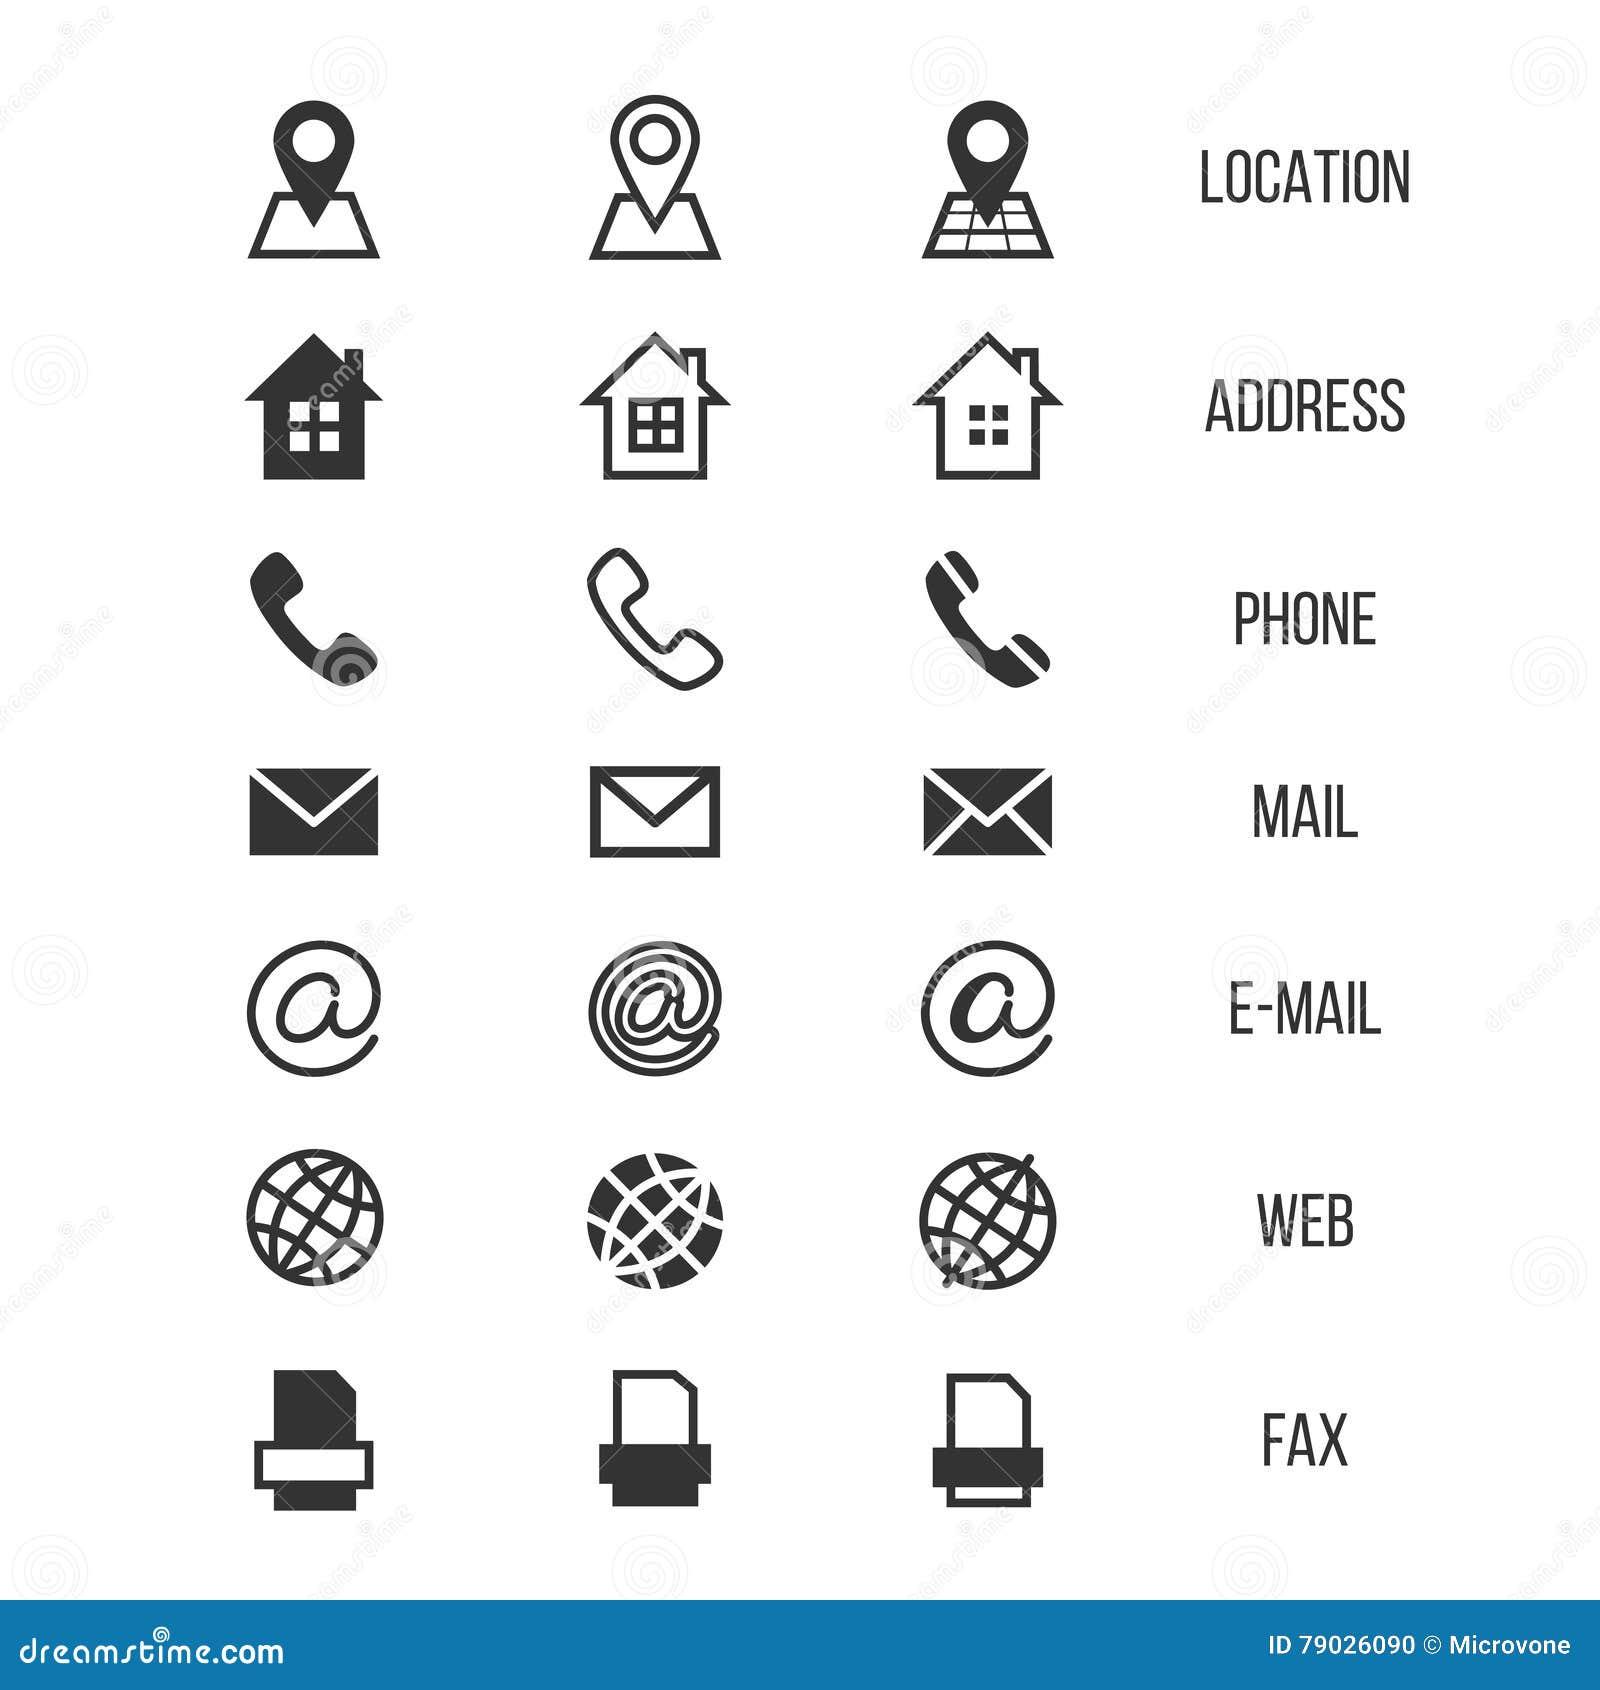 visitenkartevektorikonen  haus  telefon  adresse  telefon  fax  netz  standortsymbole vektor